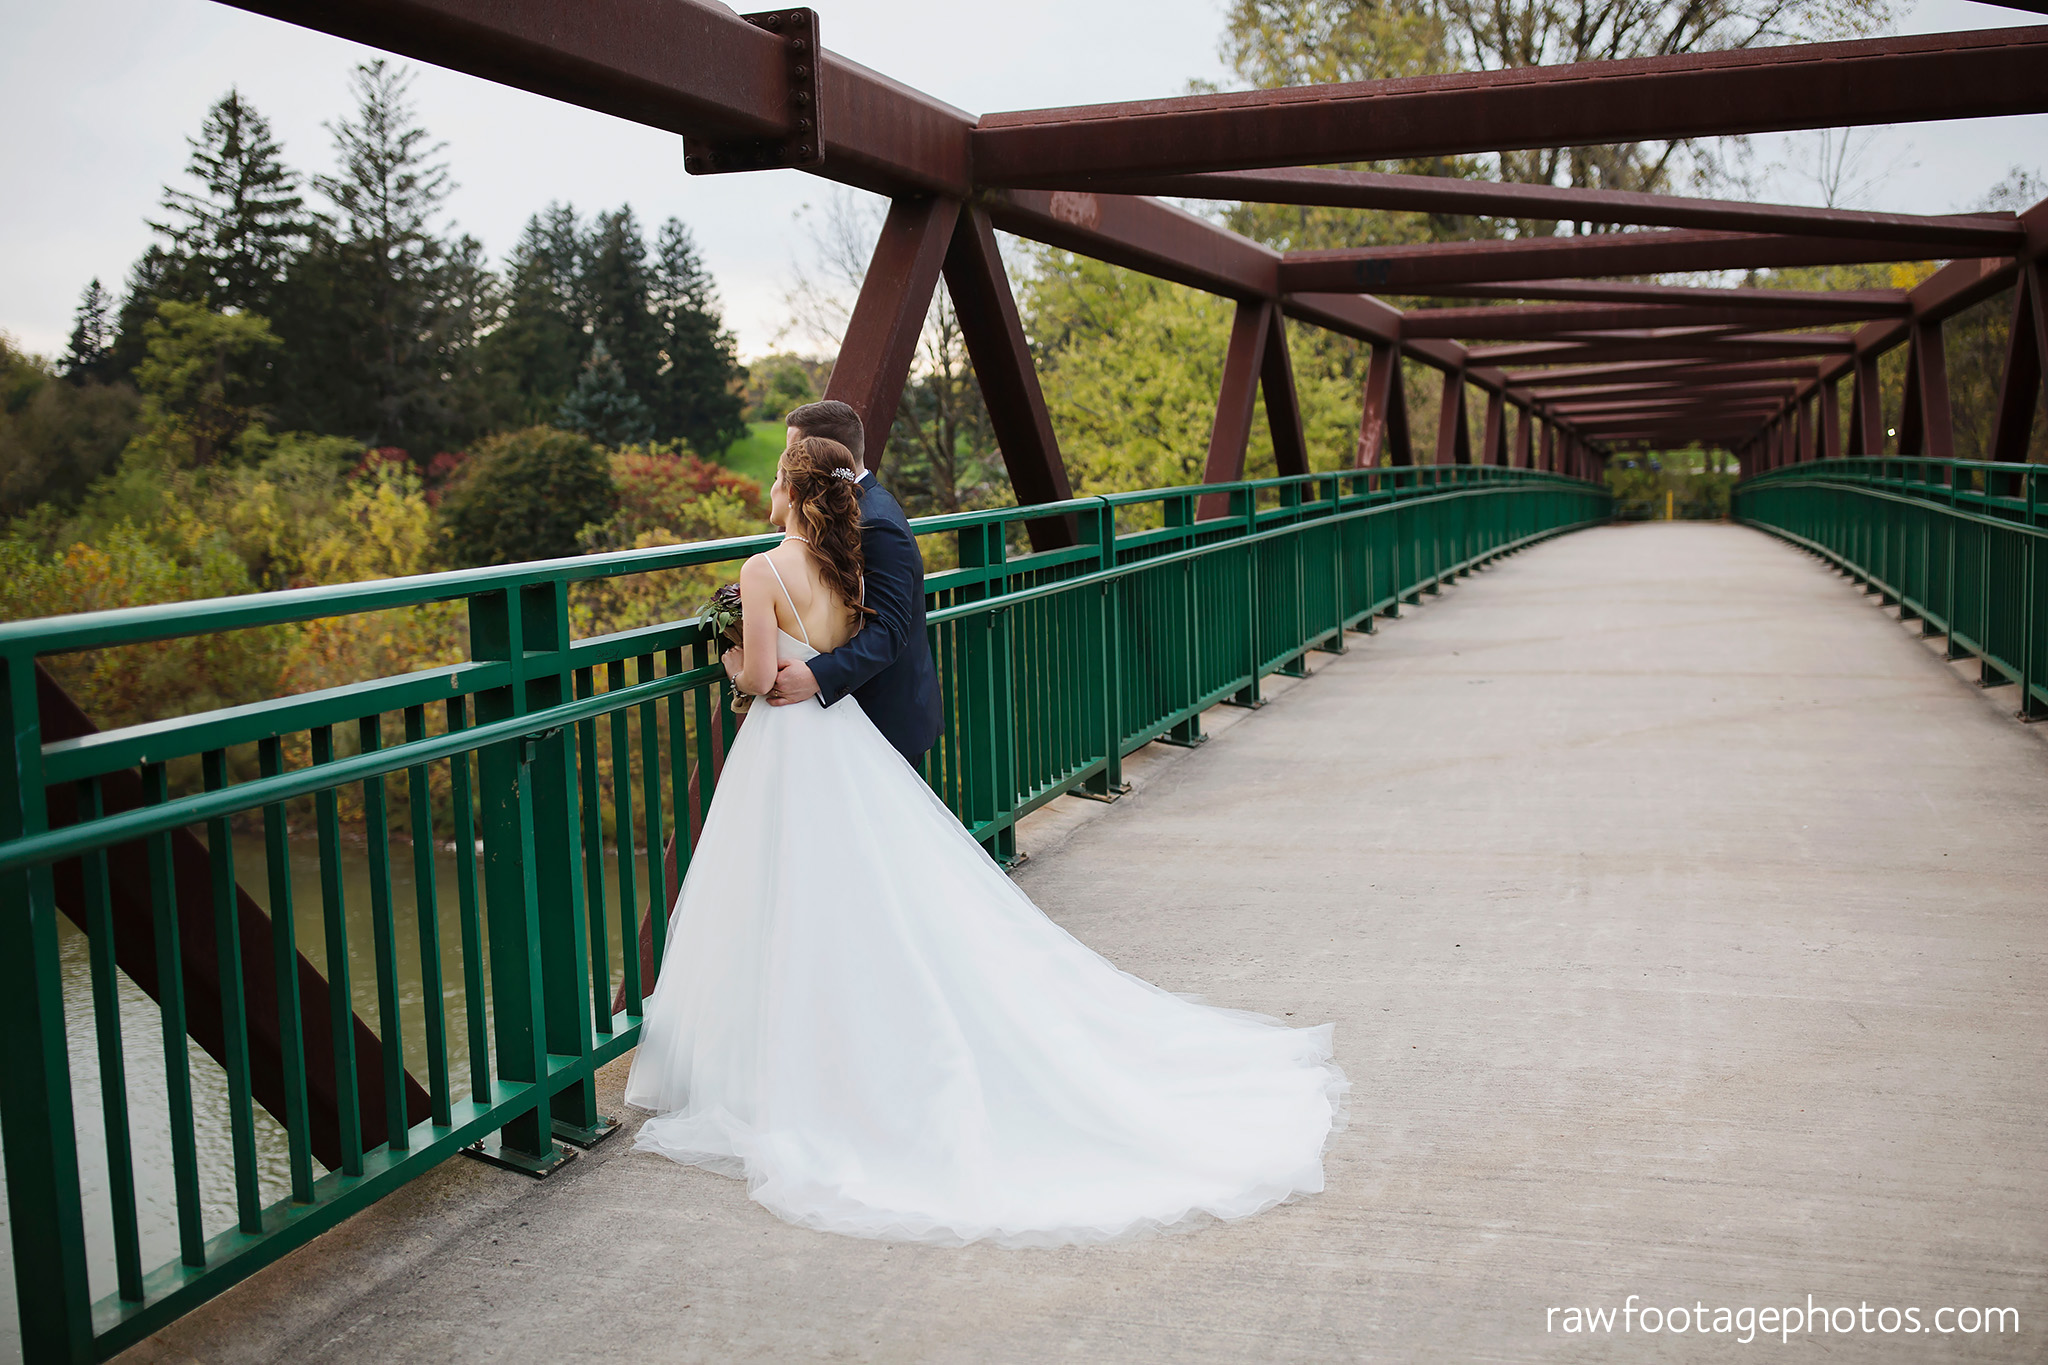 london_ontario_wedding_photographer-civic_gardens-springbank_park-succulent_bouquet-fall_wedding-bridge-raw_footage_photography069.jpg